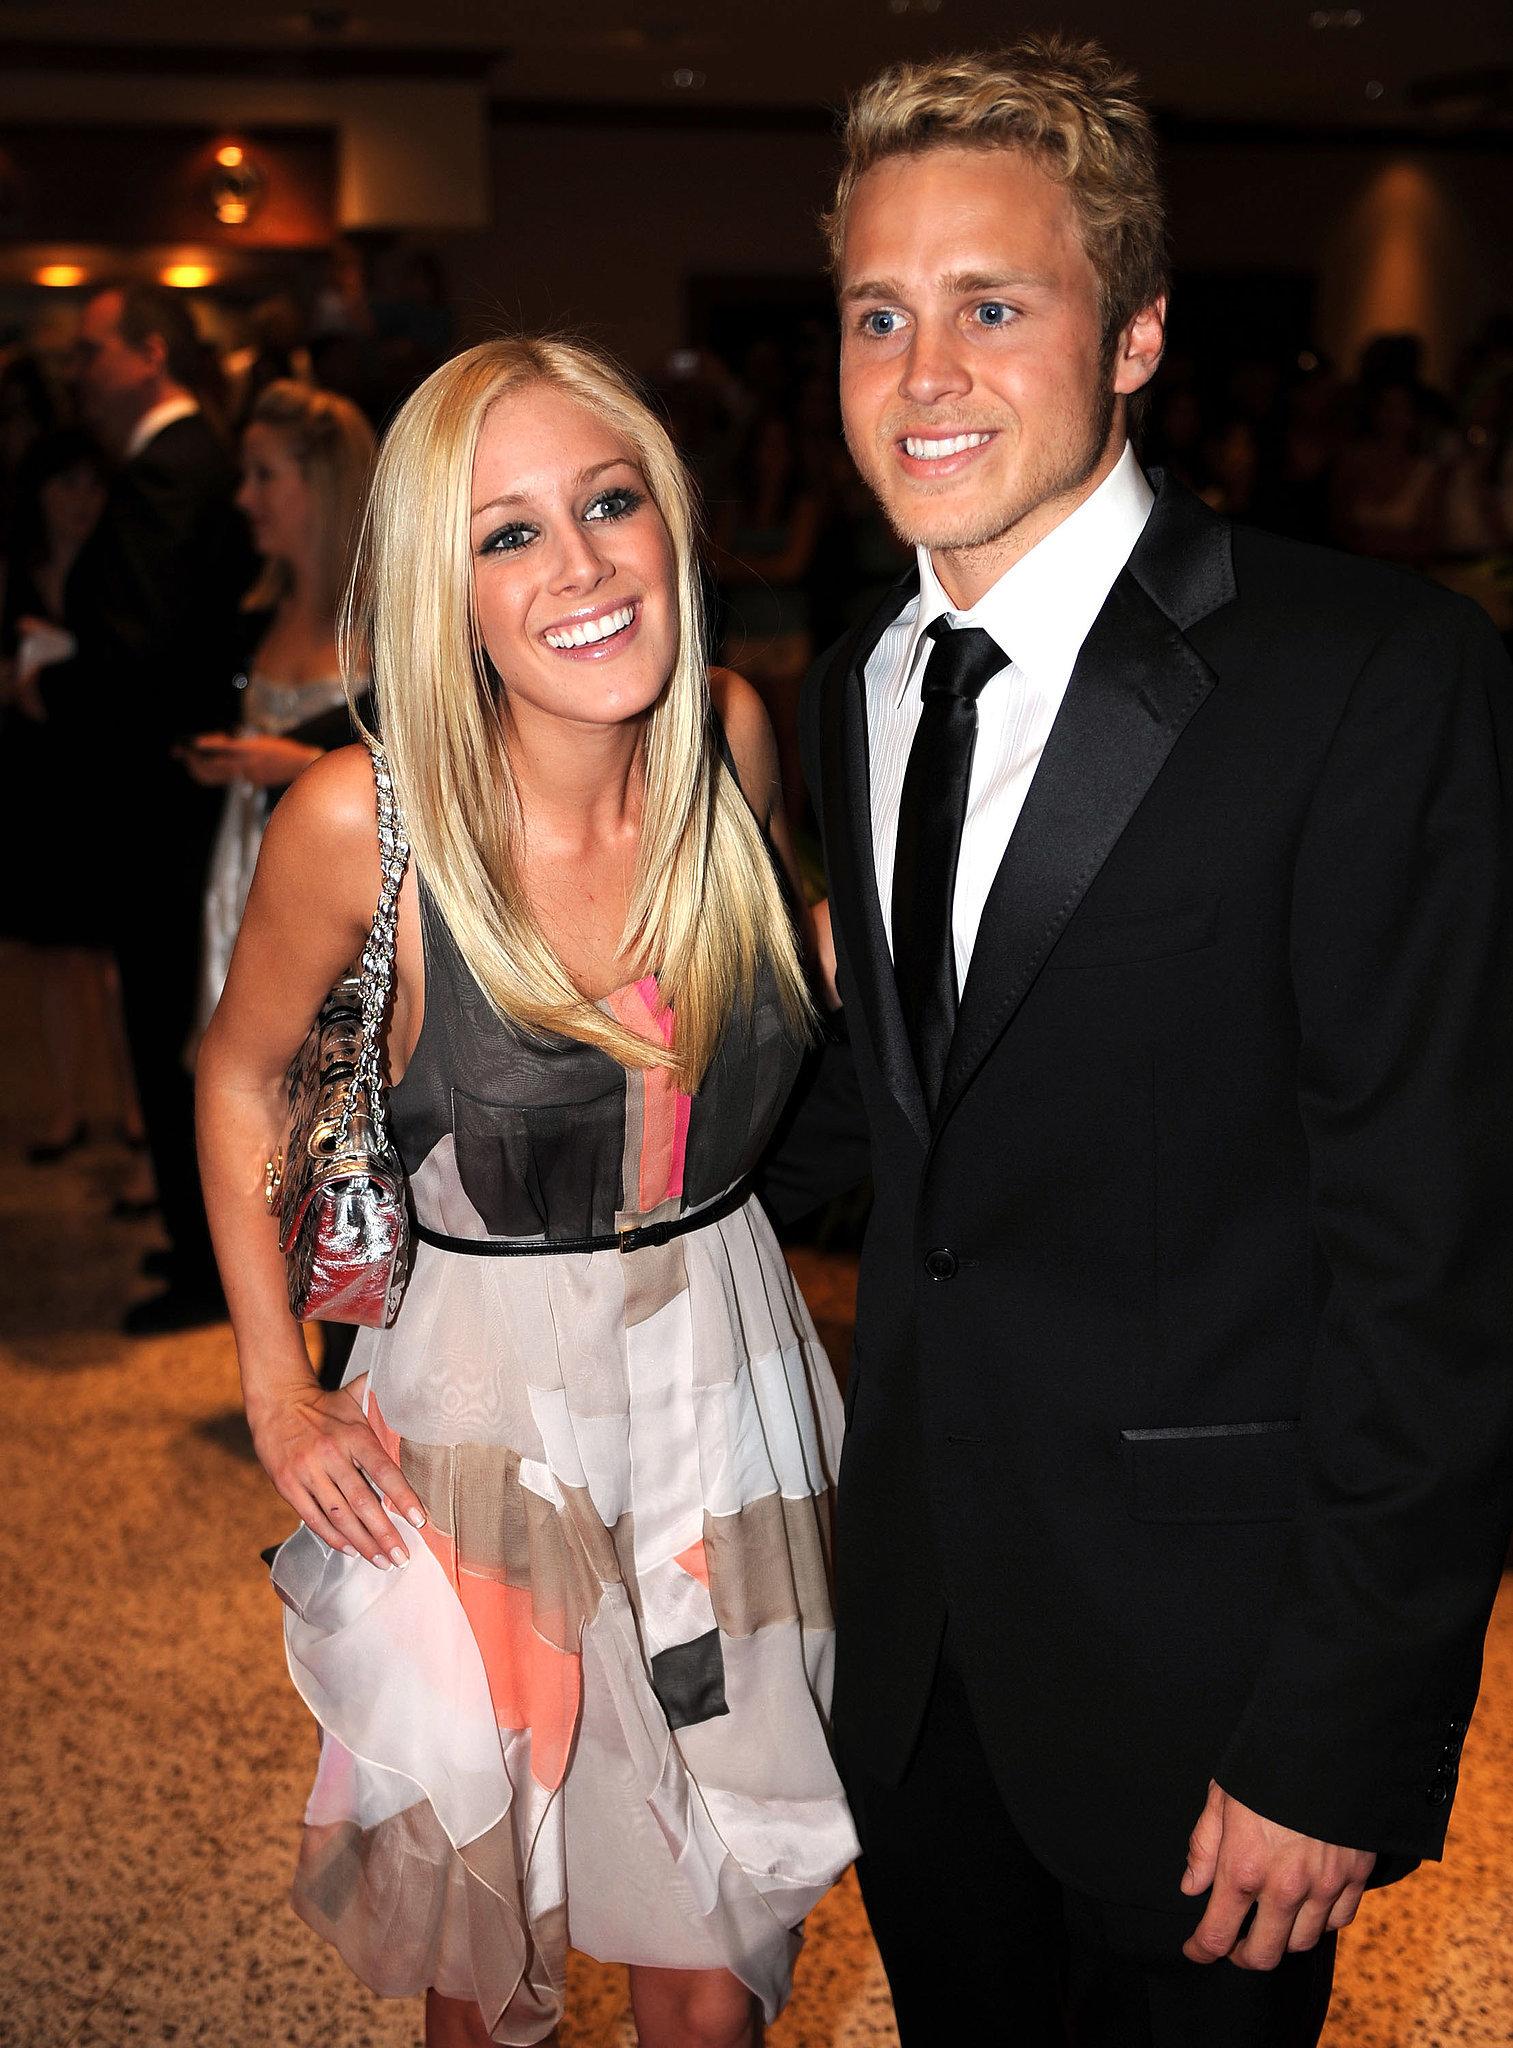 No. 1: Heidi Montag and Spencer Pratt in 2008